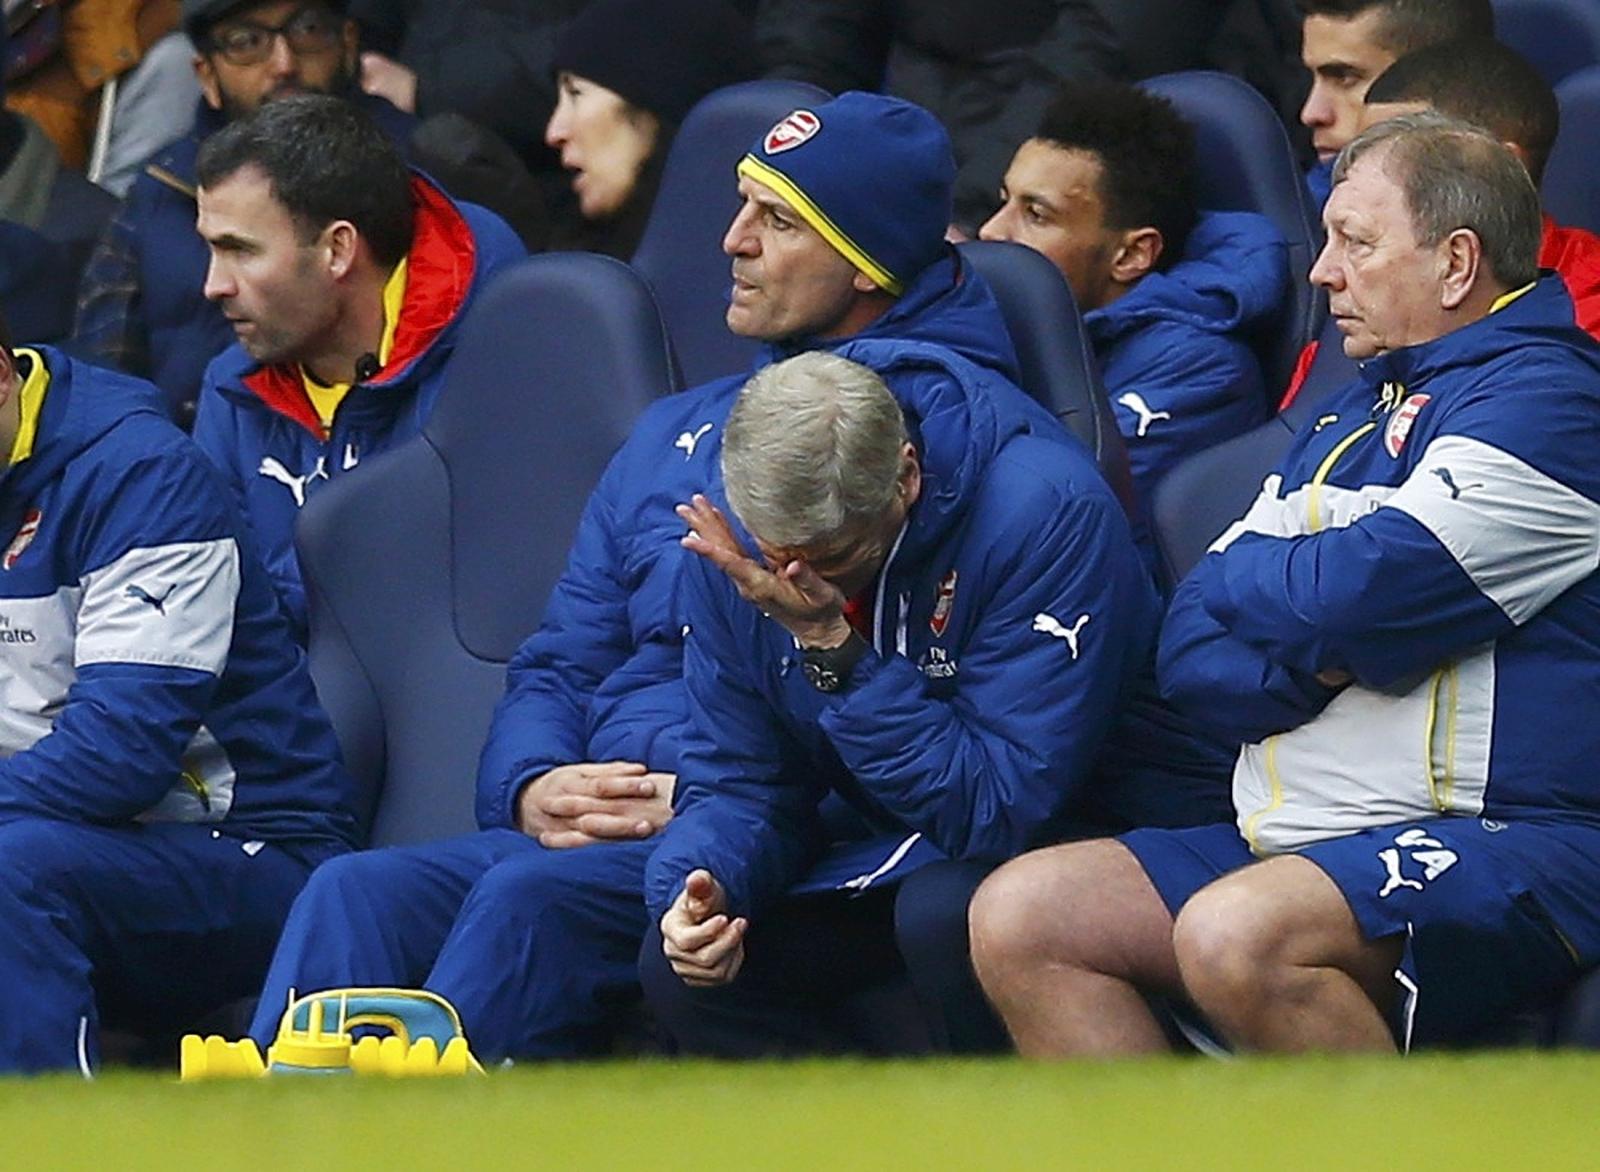 Arsene Wenger: Focus on the next match not memories